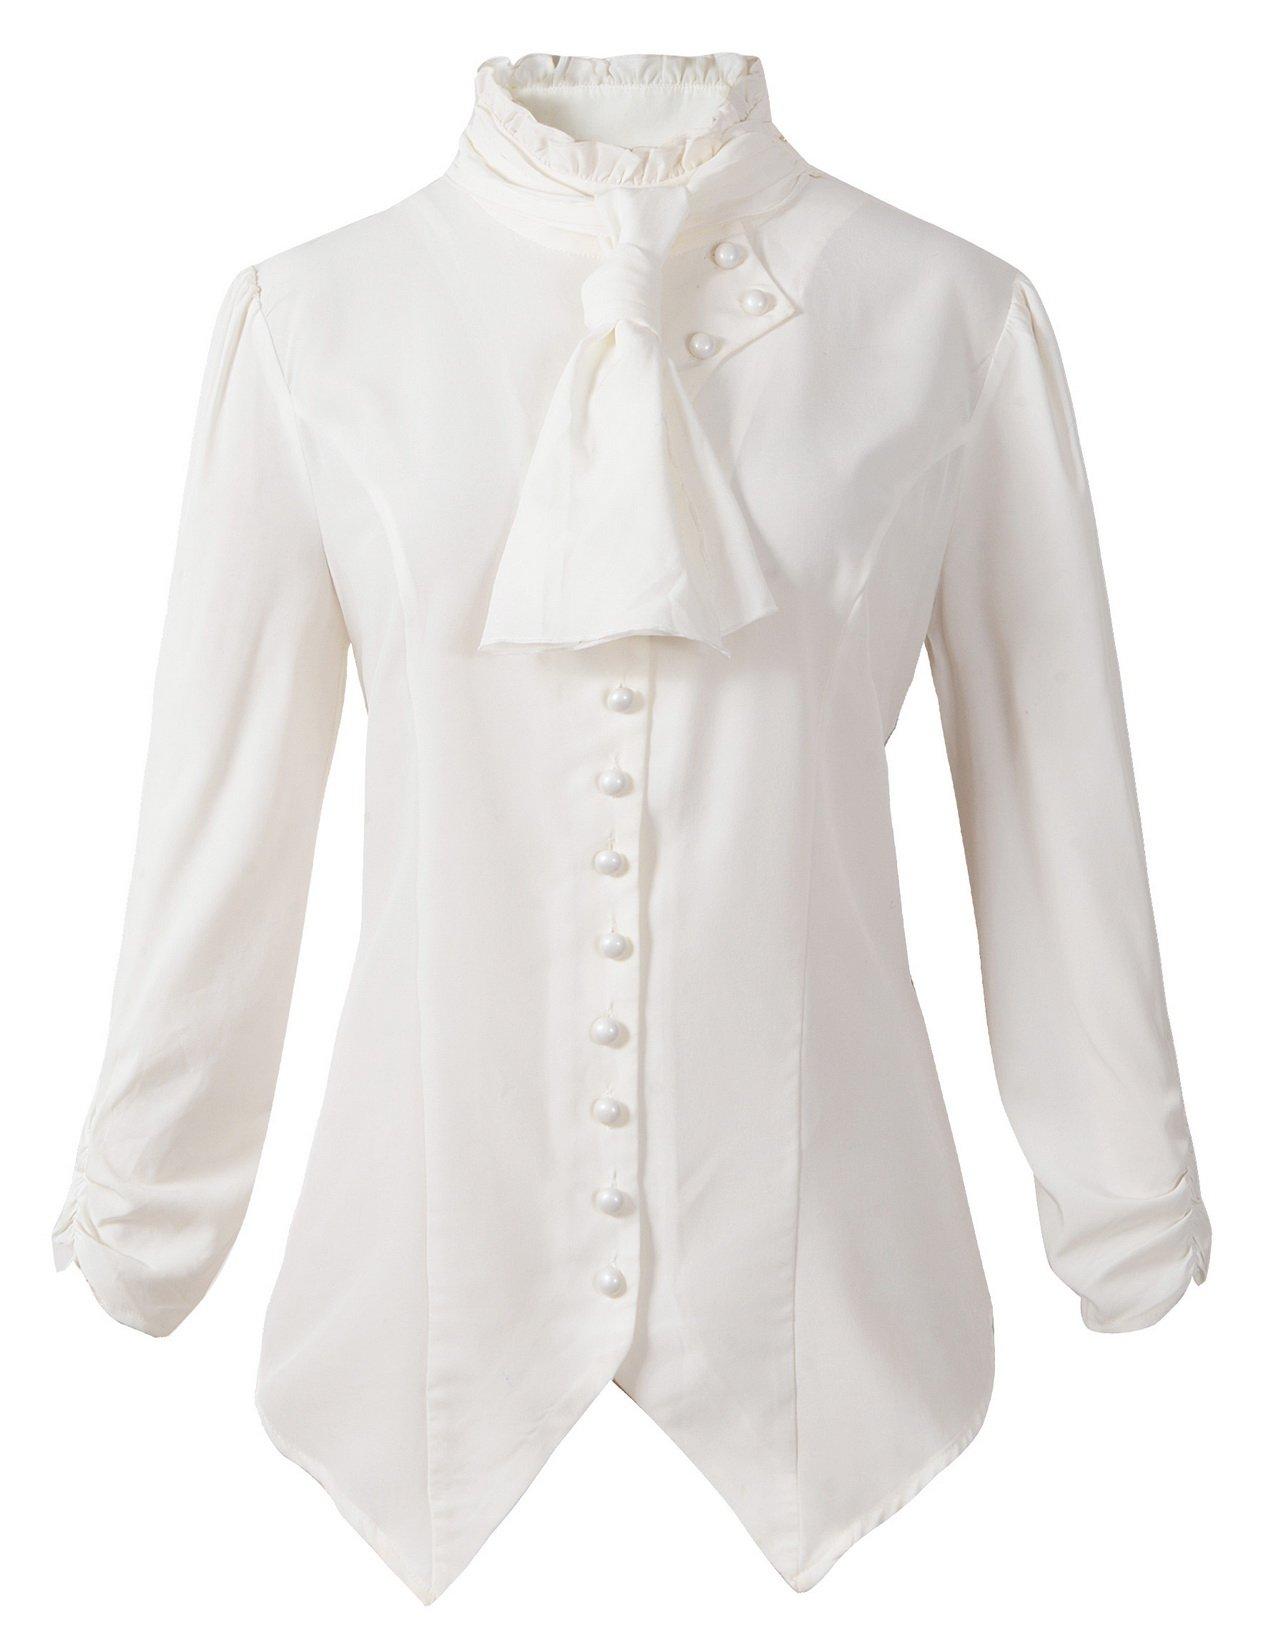 DarcChic Womens Gothic Victorian Steampunk Ruffle Vamp Renaissance Pirate Blouse Shirt Top 3